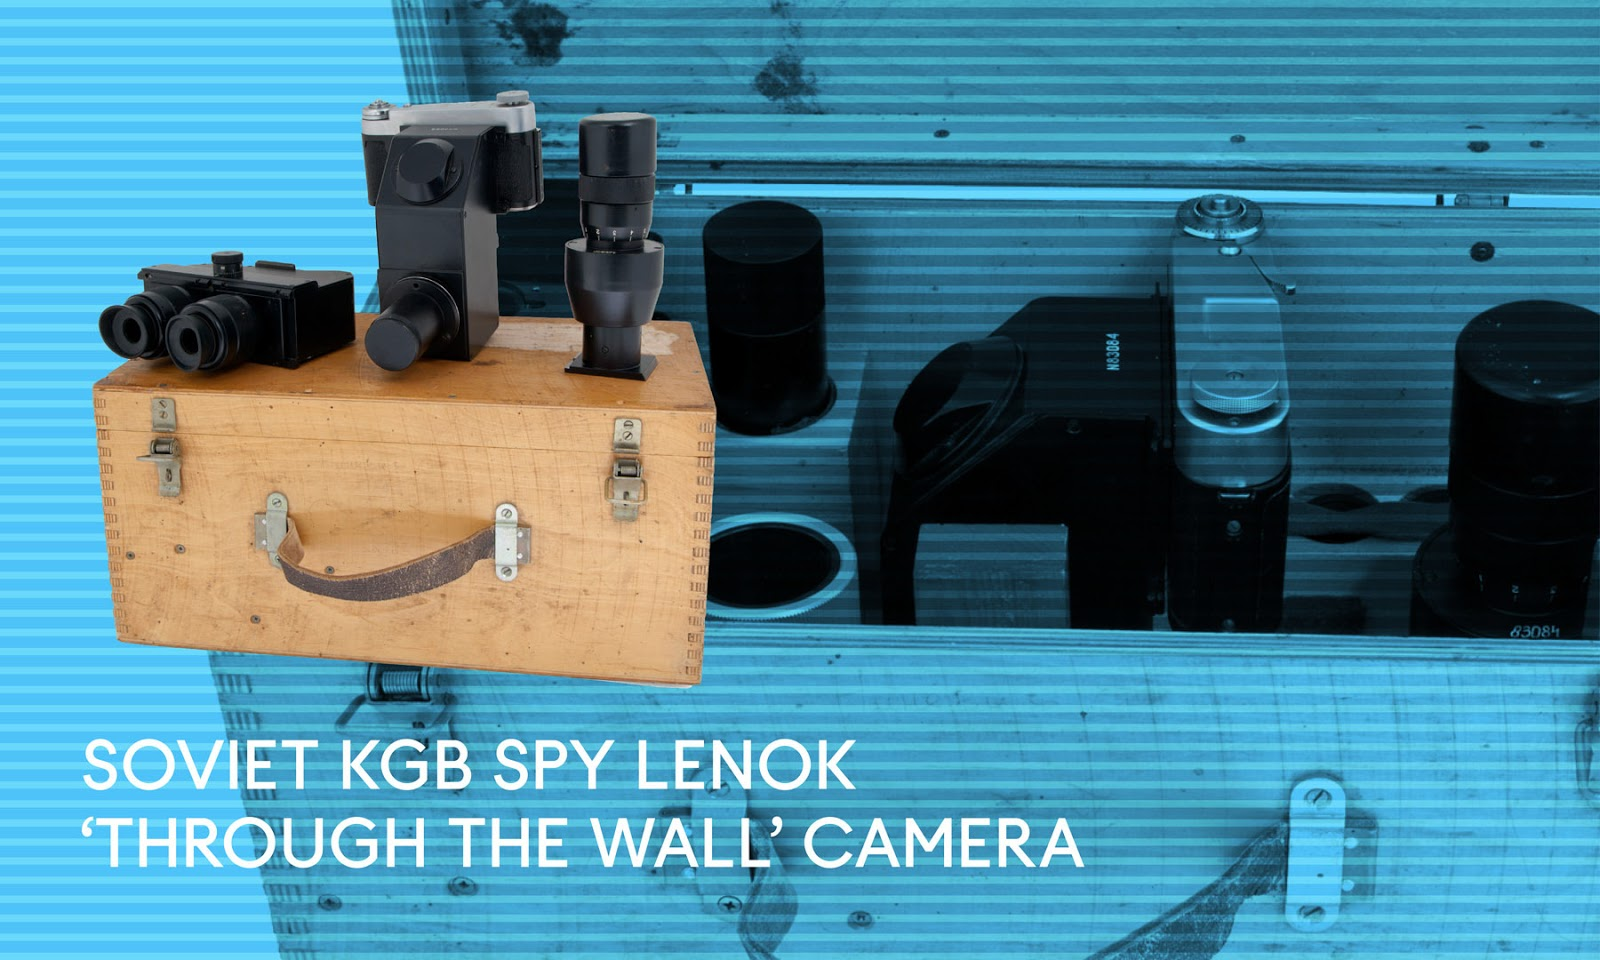 through the wall camera